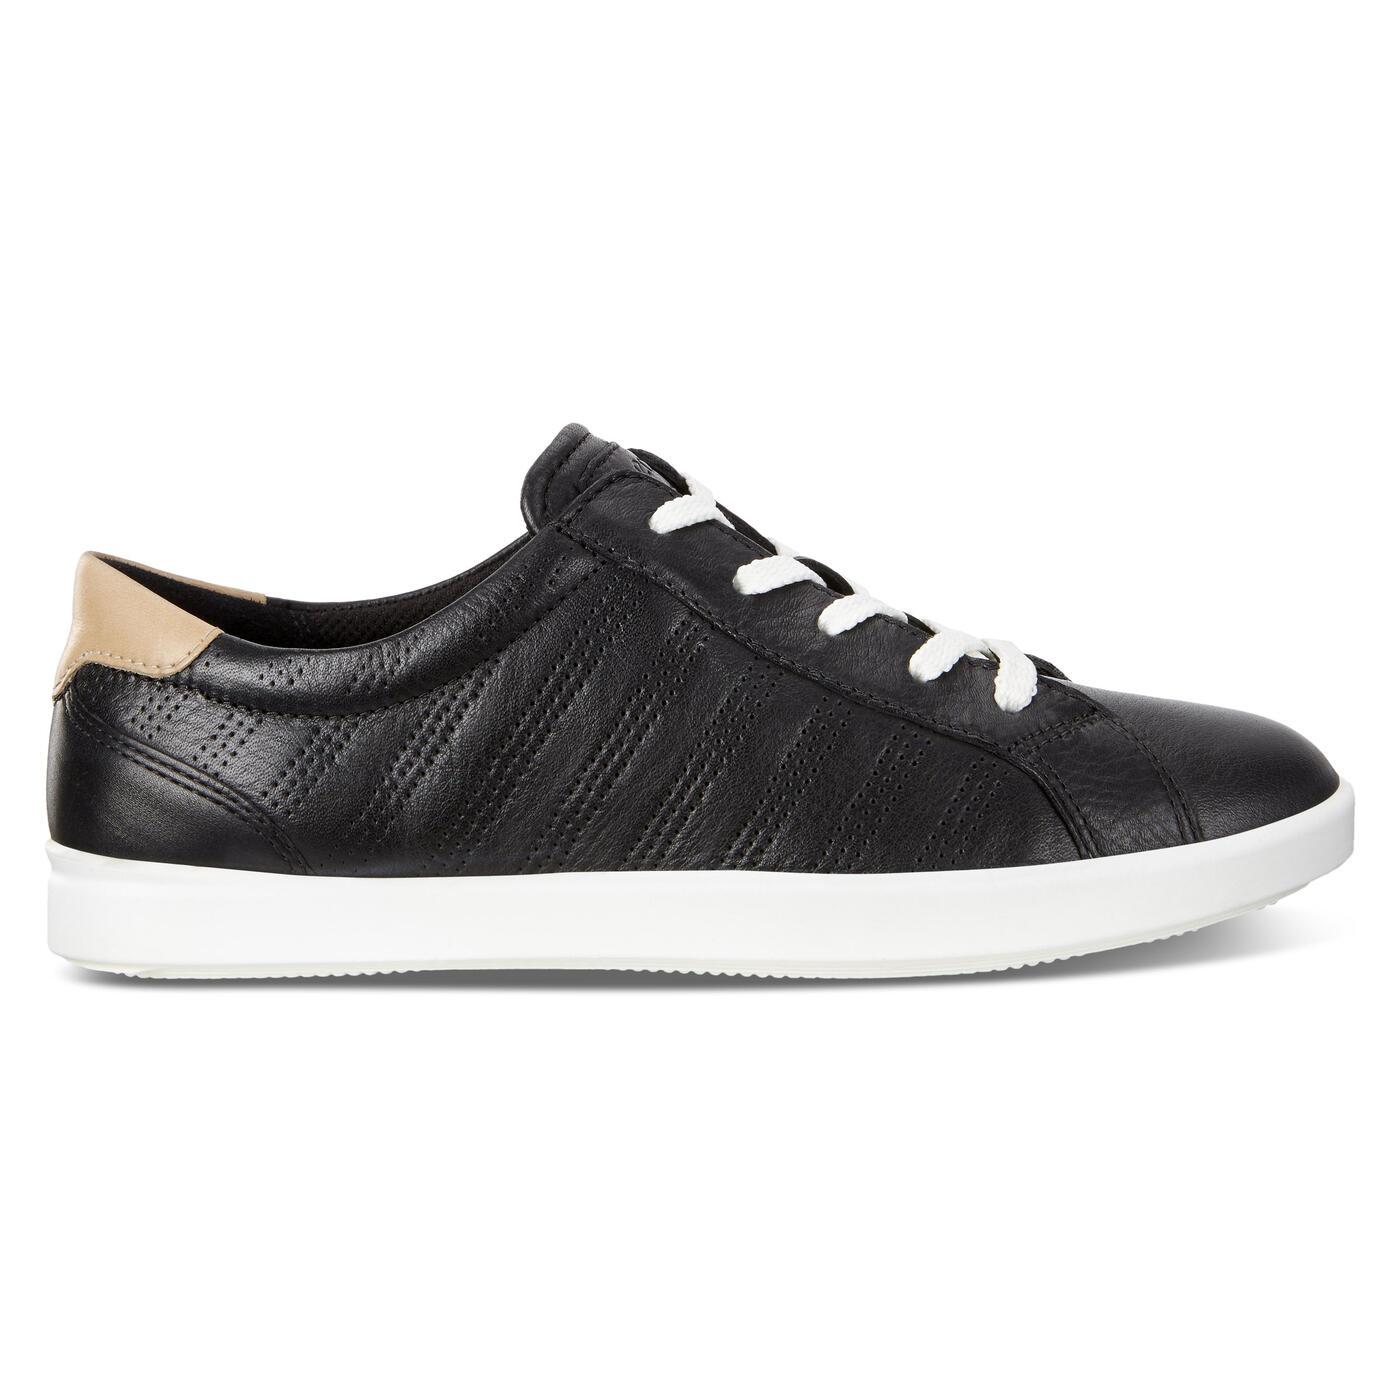 ECCO LEISURE Shoe